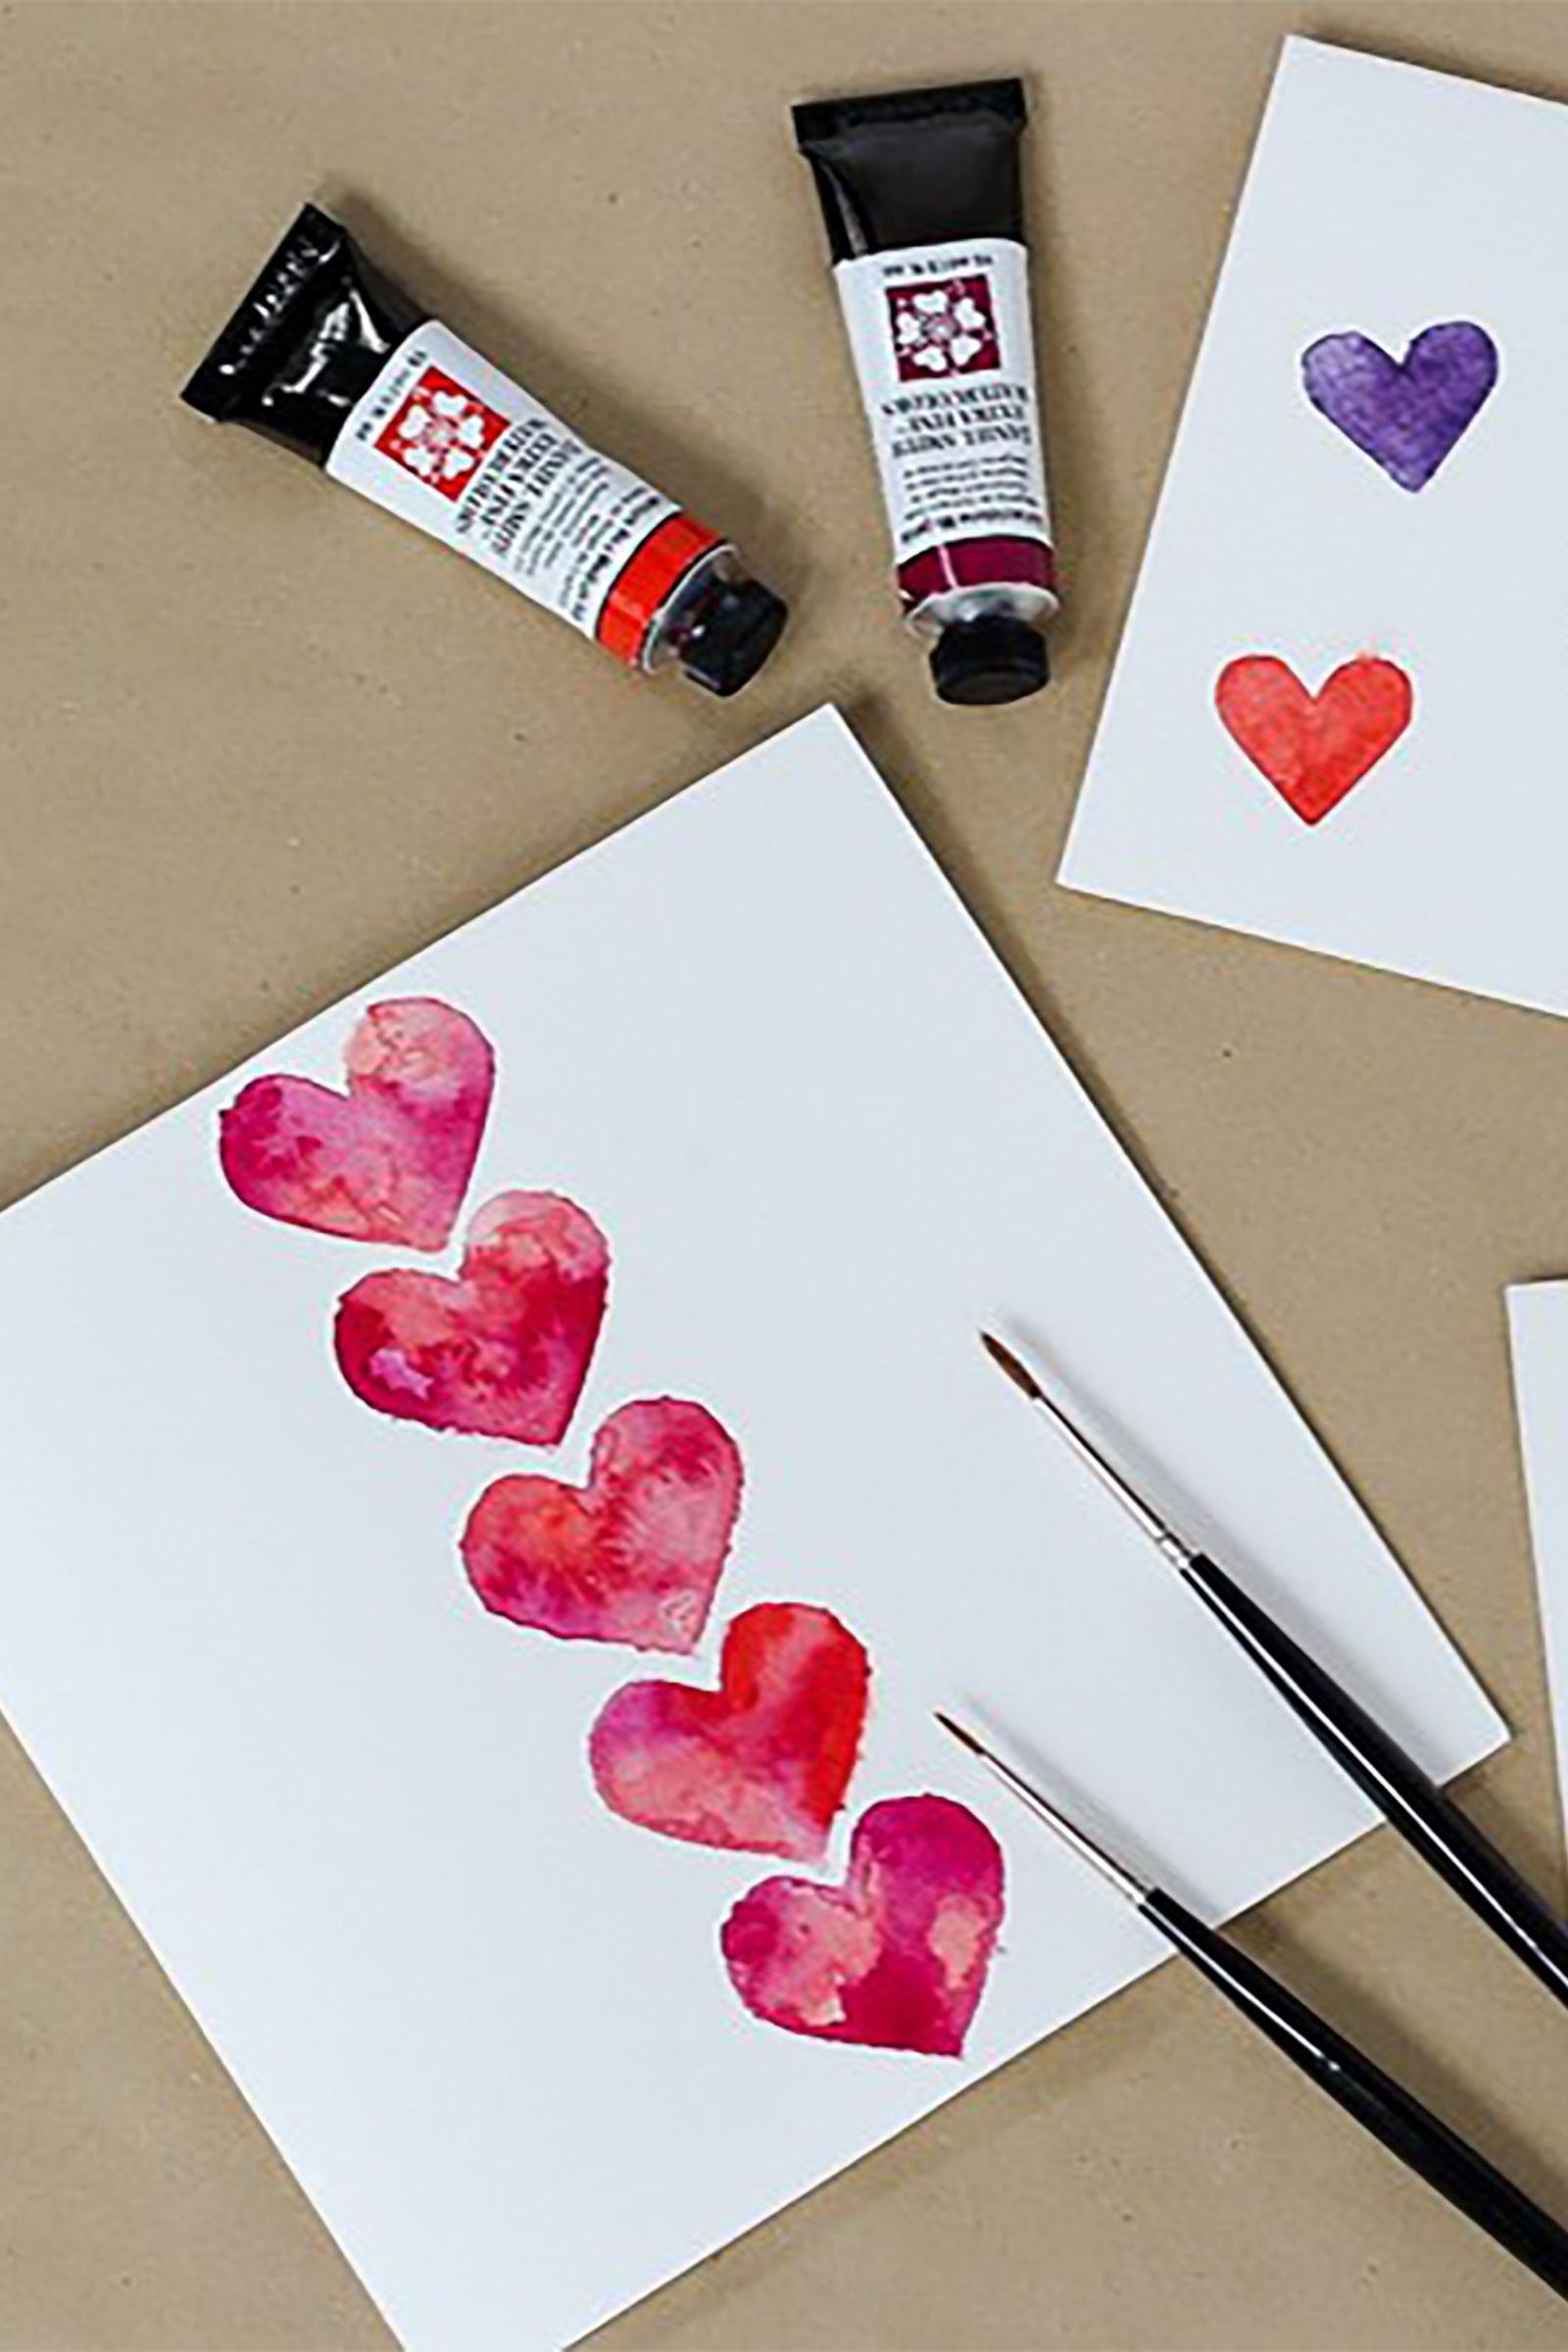 10 Best Homemade Valentines Day Card Ideas 26 diy valentines day cards homemade valentines country living 2020